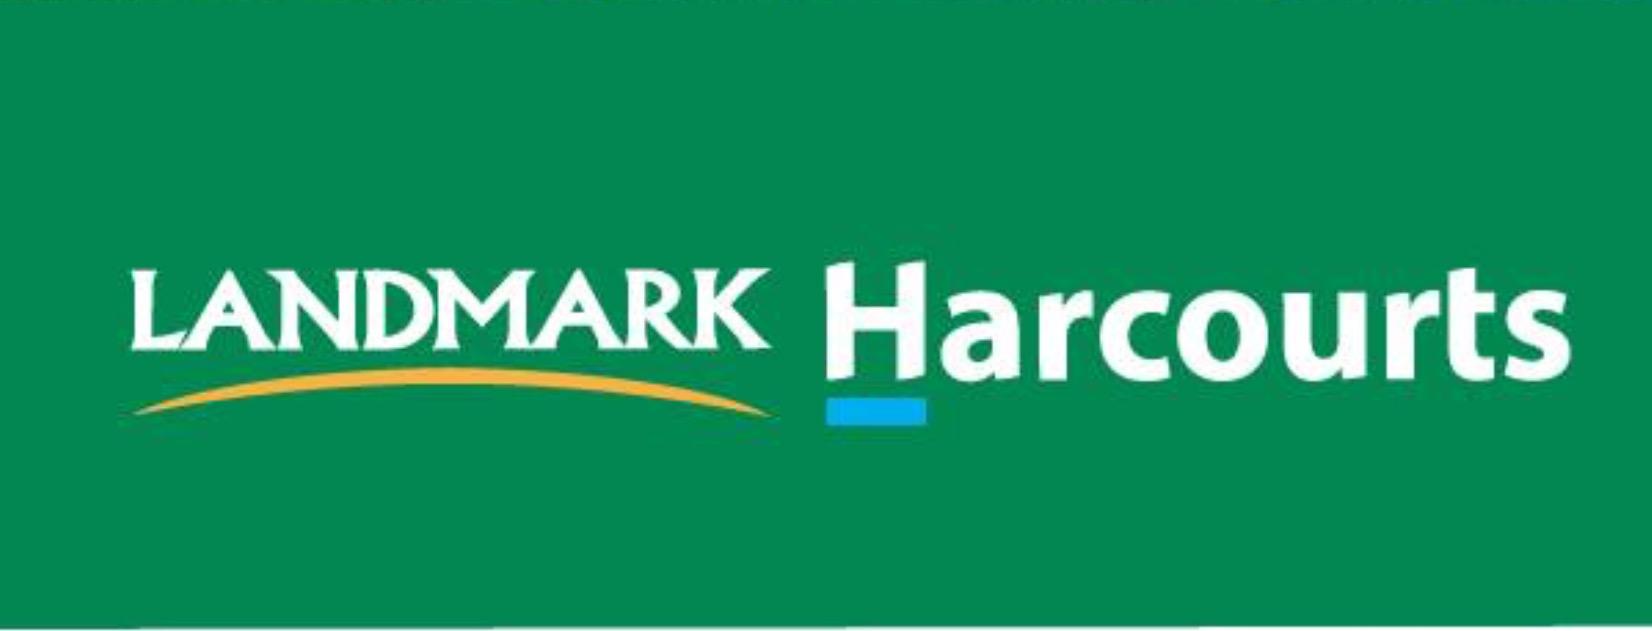 Landmark Harcourts , Strathalbyn, 5255